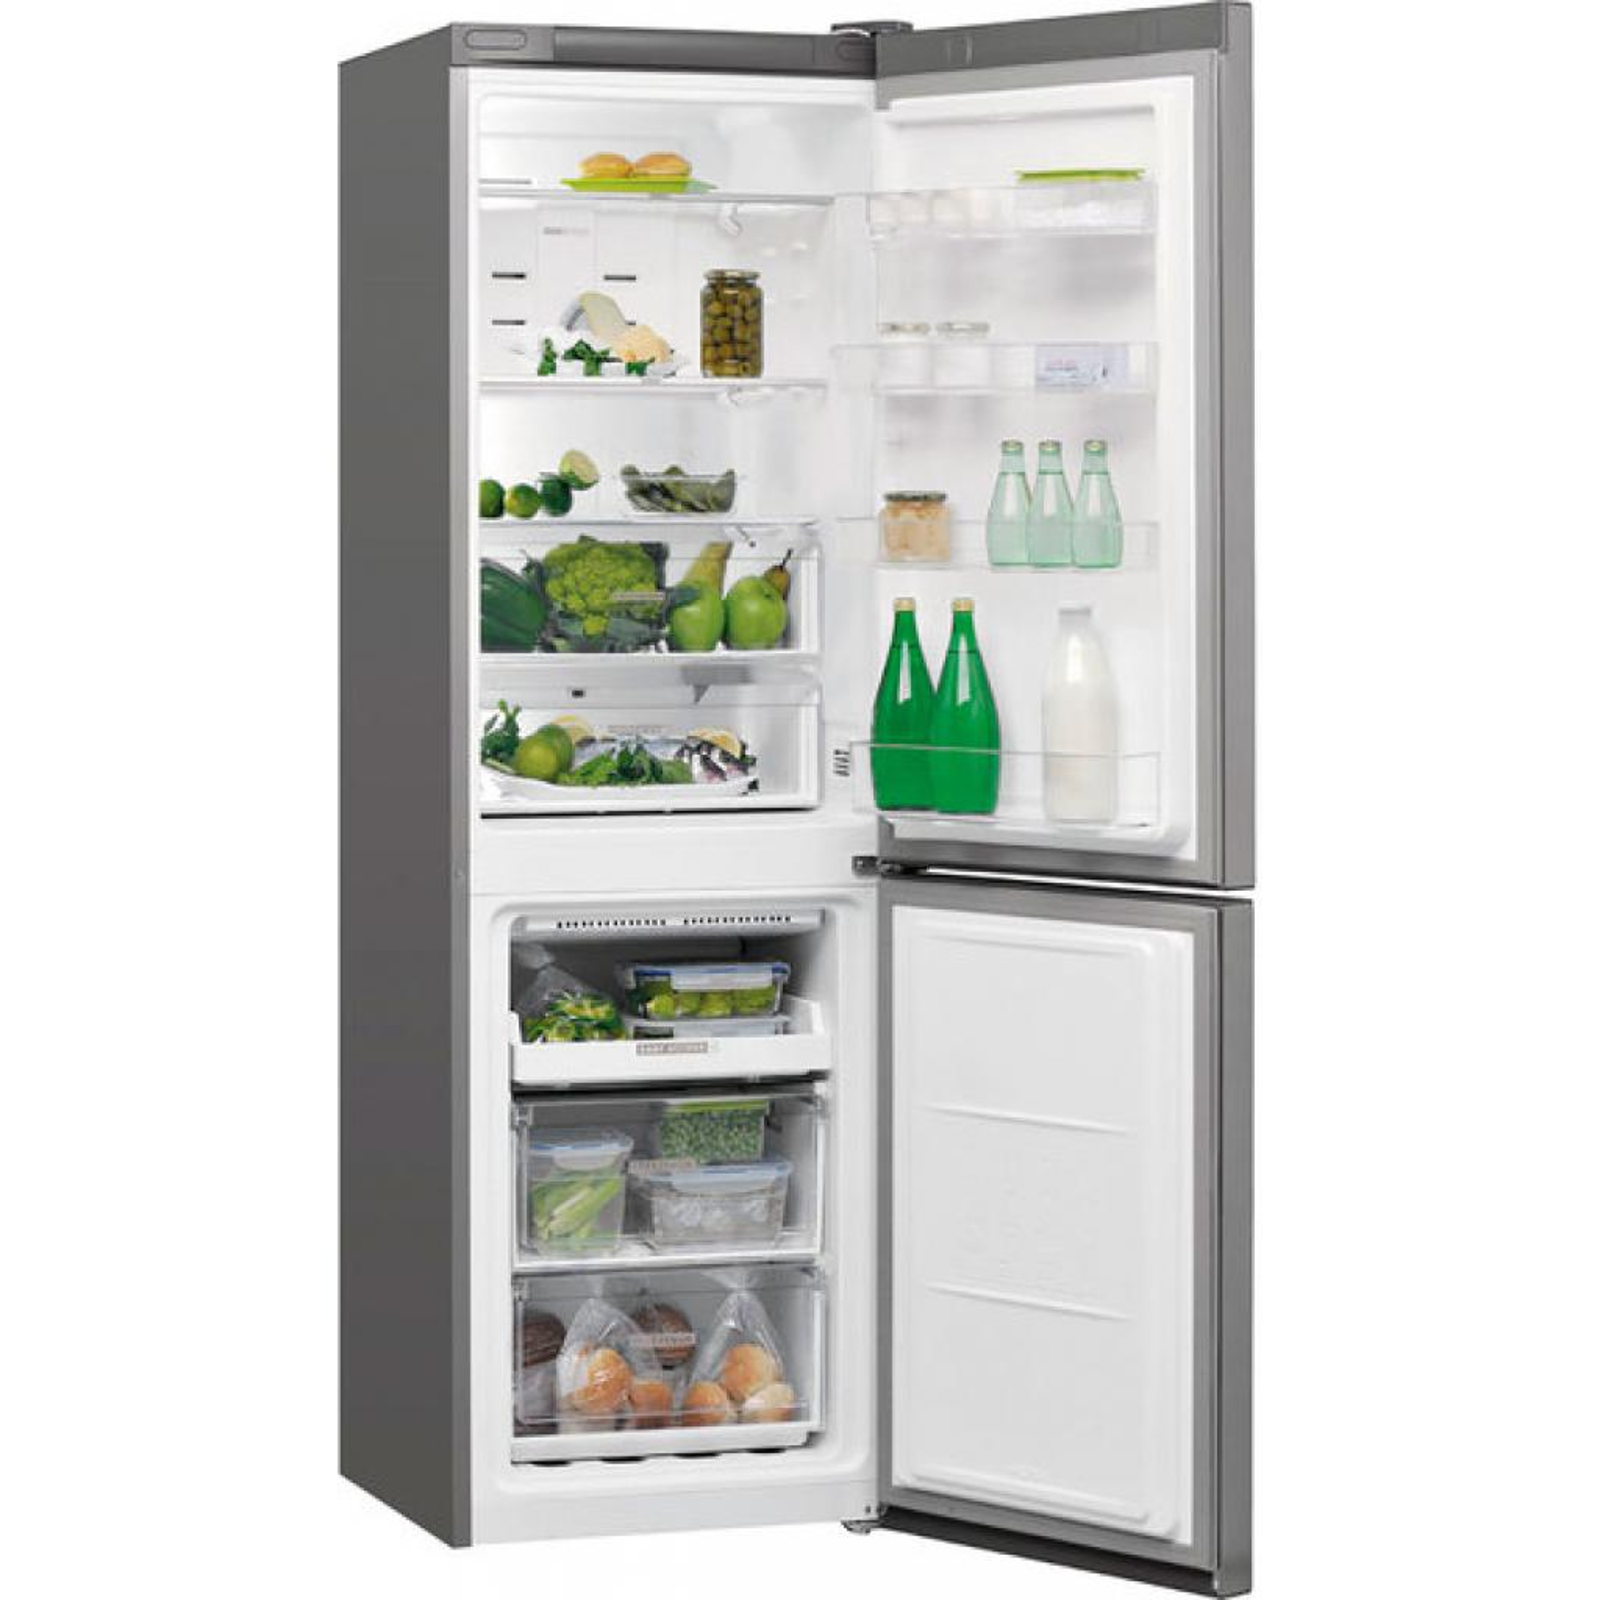 Холодильник Whirlpool W7811OOX изображение 3